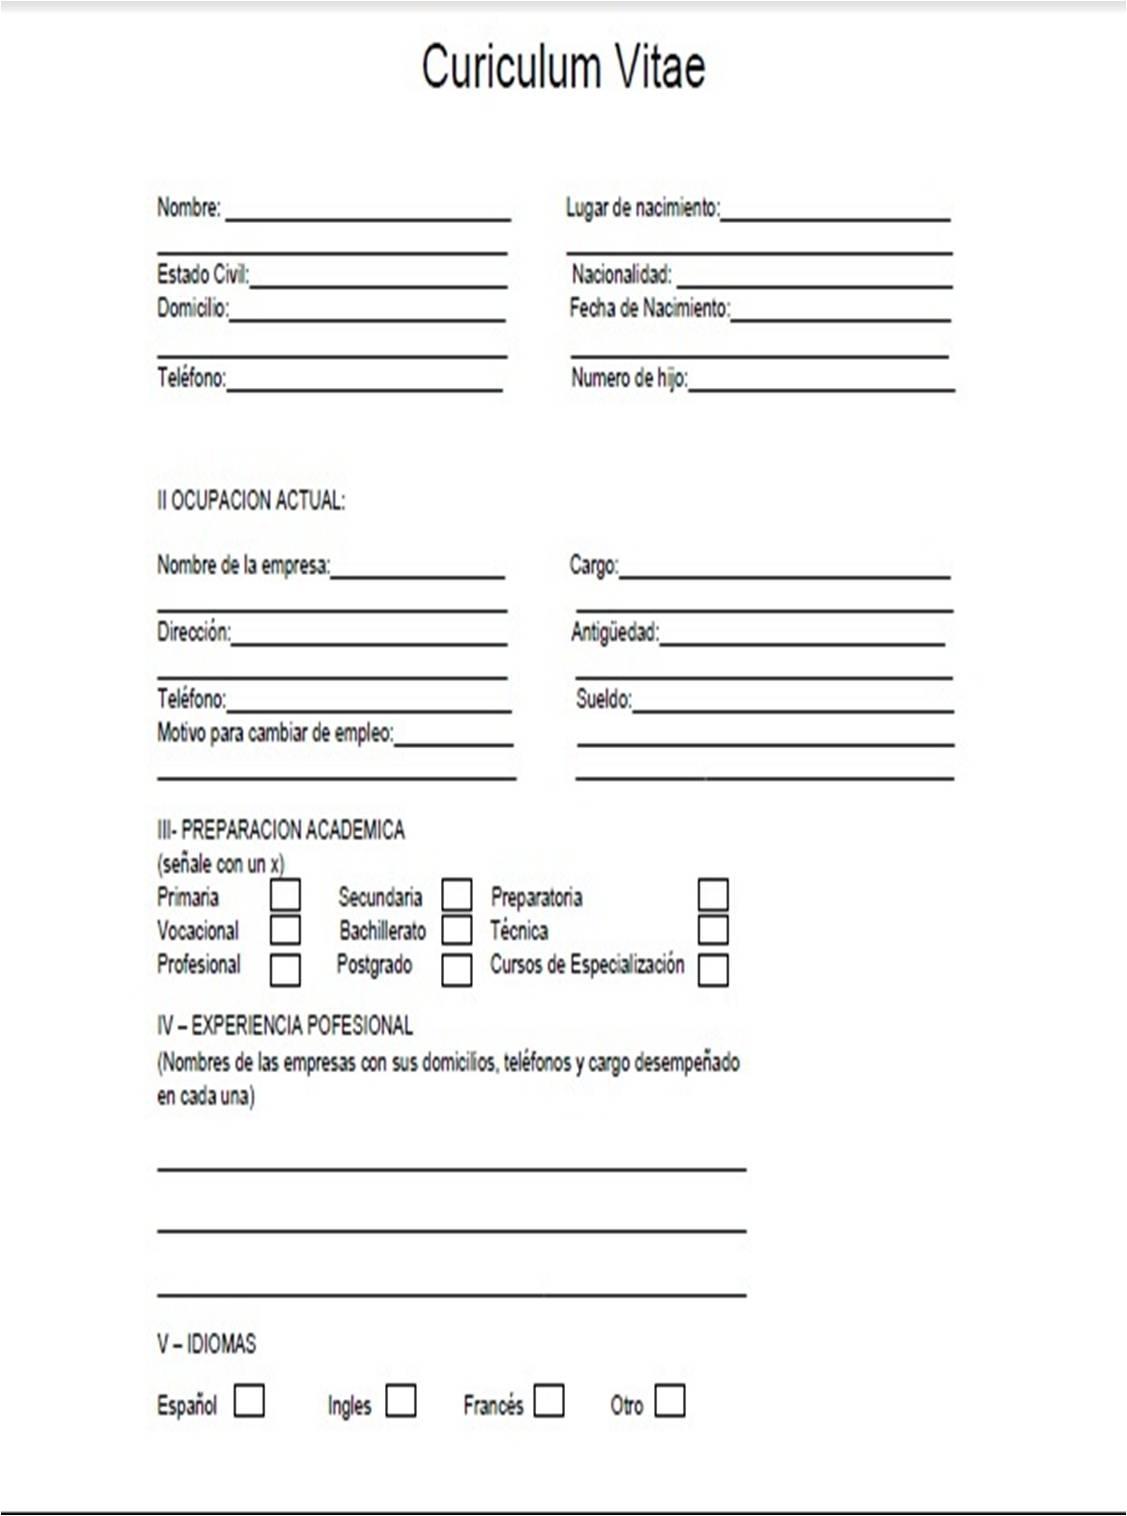 Guia documentacion Administrativa 2a: curriculum vitae